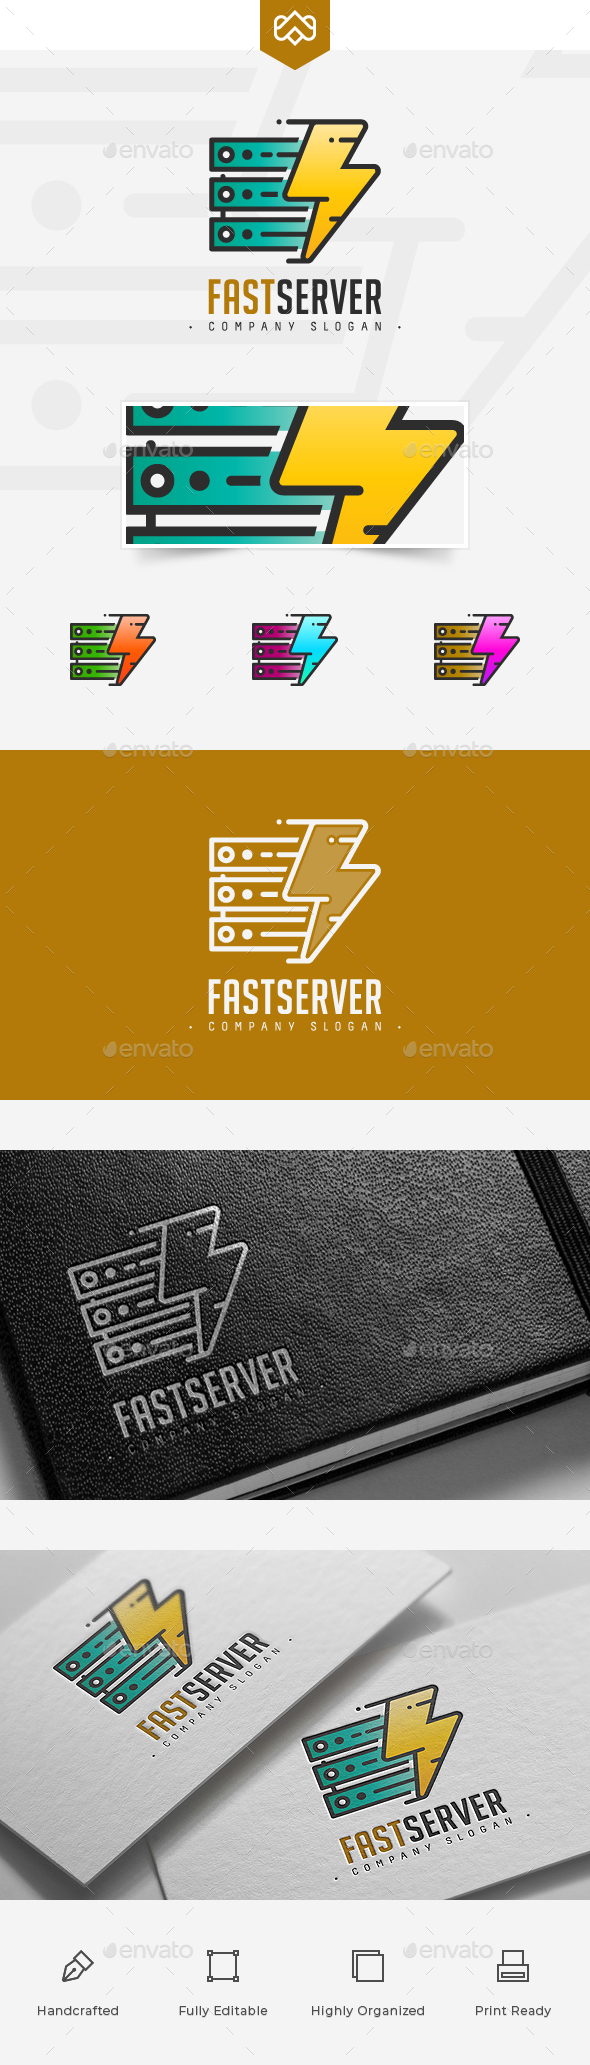 Fast Server Logo - Company Logo Templates